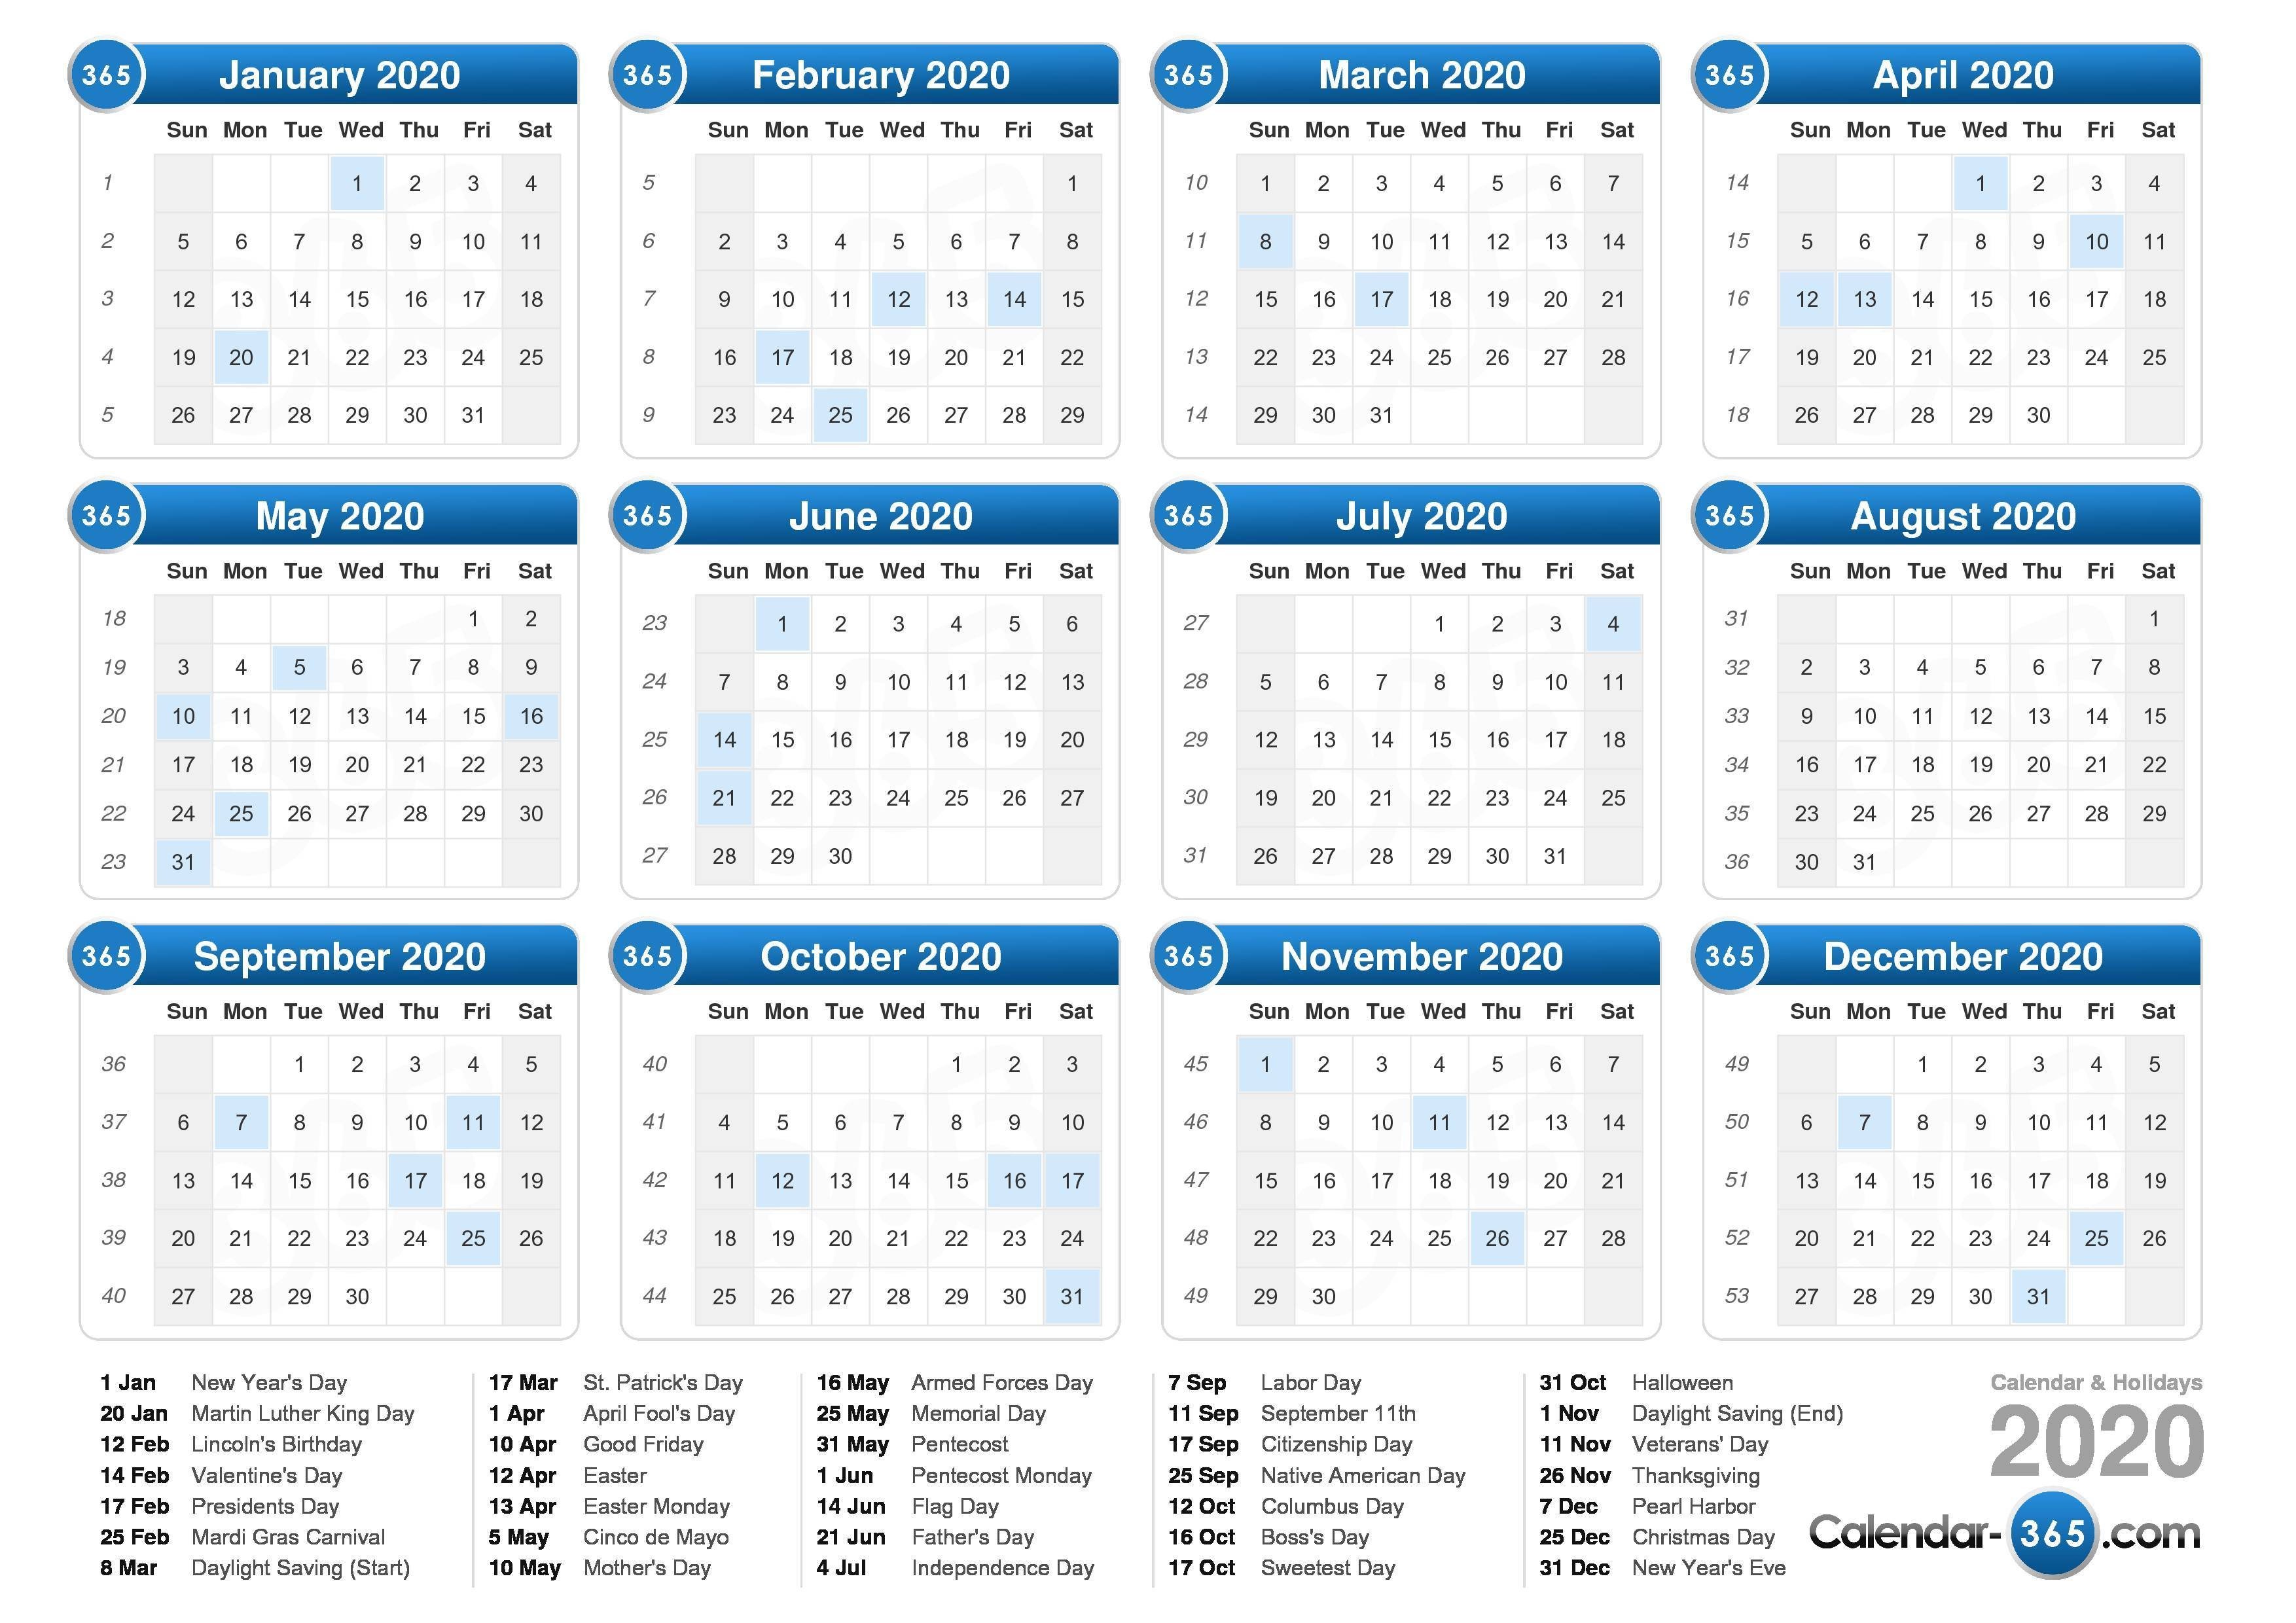 2020 and 2020 Calendar Printable 2020 Calendar